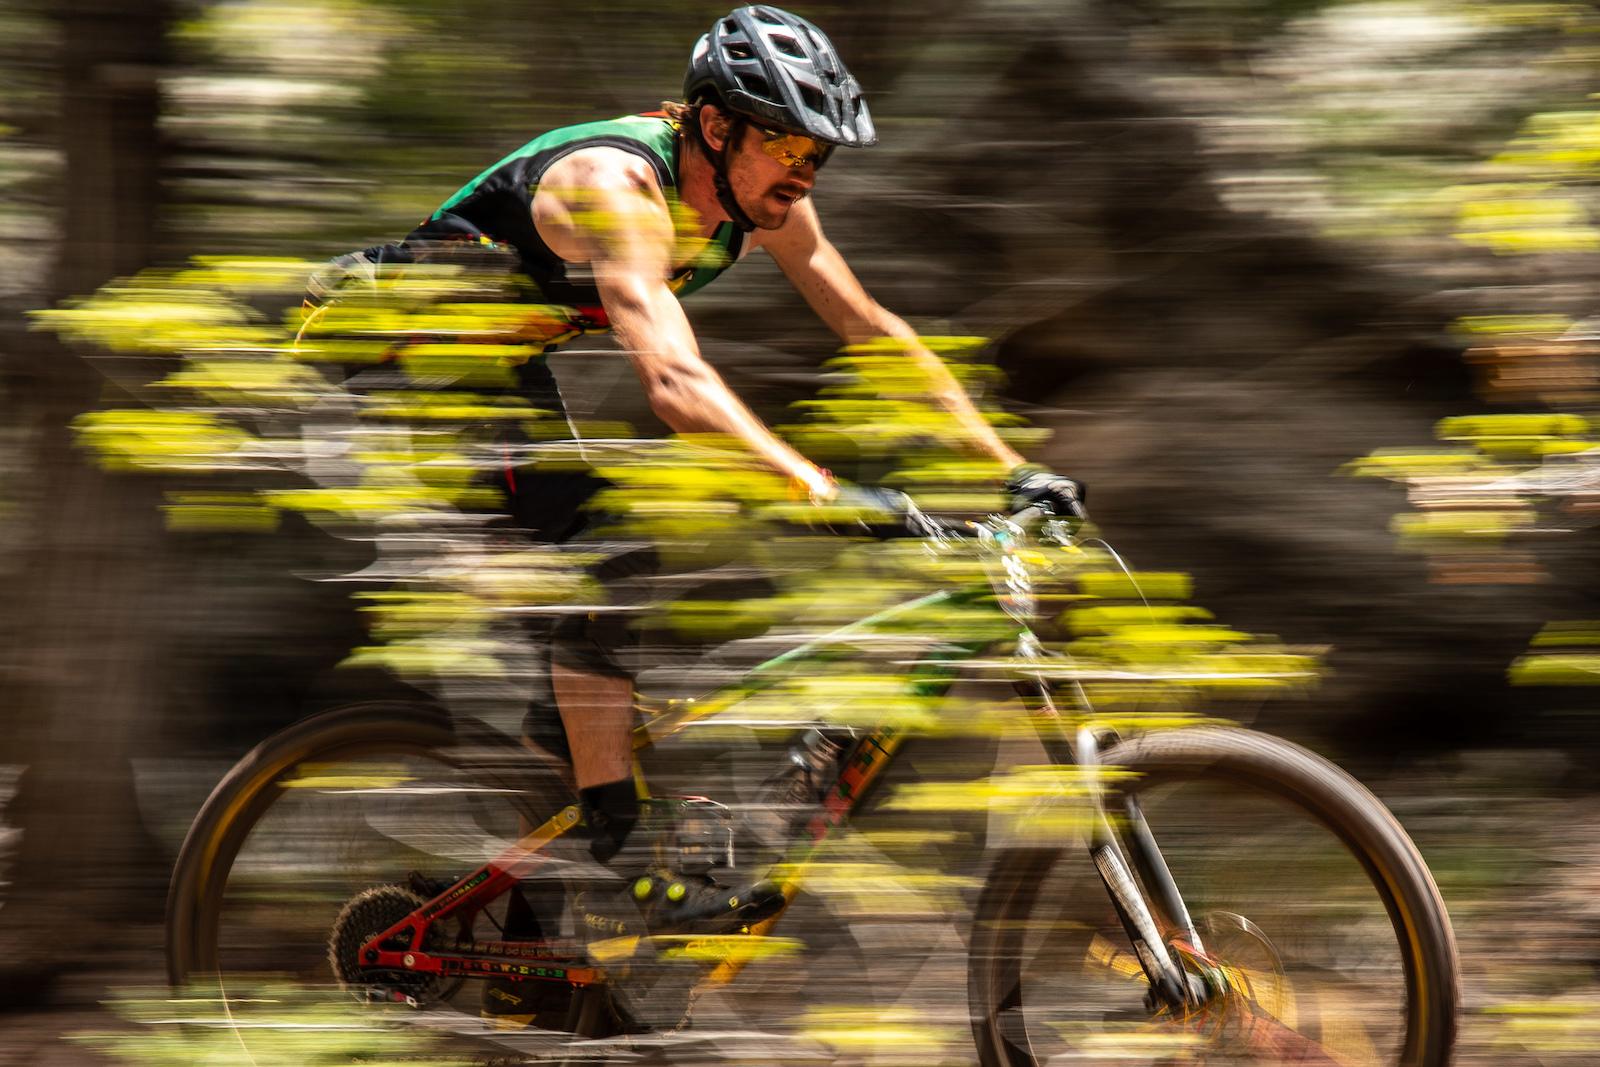 EddieClarkMedia - Adam Procise 2019 Big Mountain Enduro Santa Fe NM